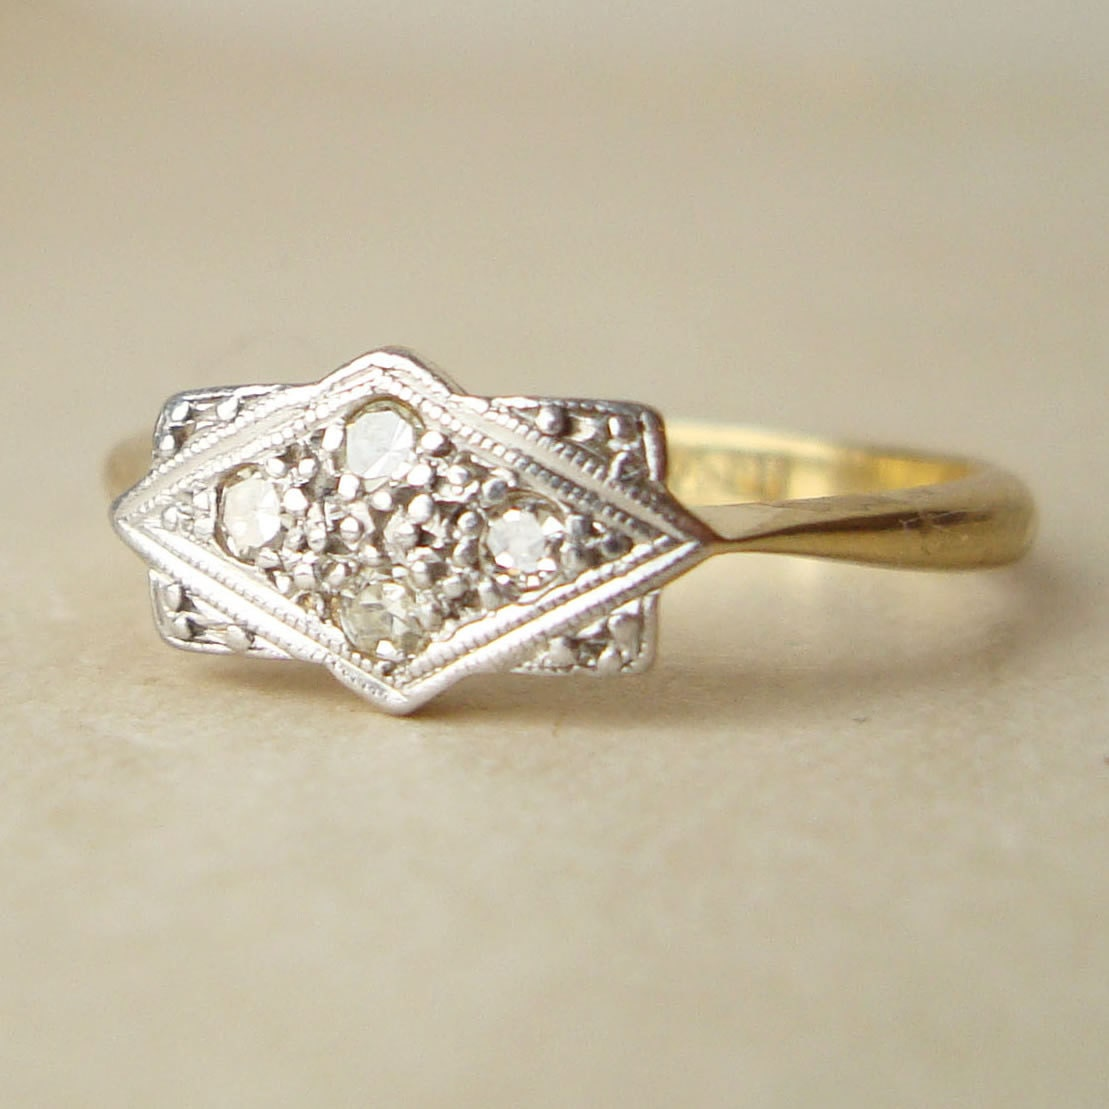 Antique engagement ring art deco 18k gold diamond ring for Art craft engagement rings